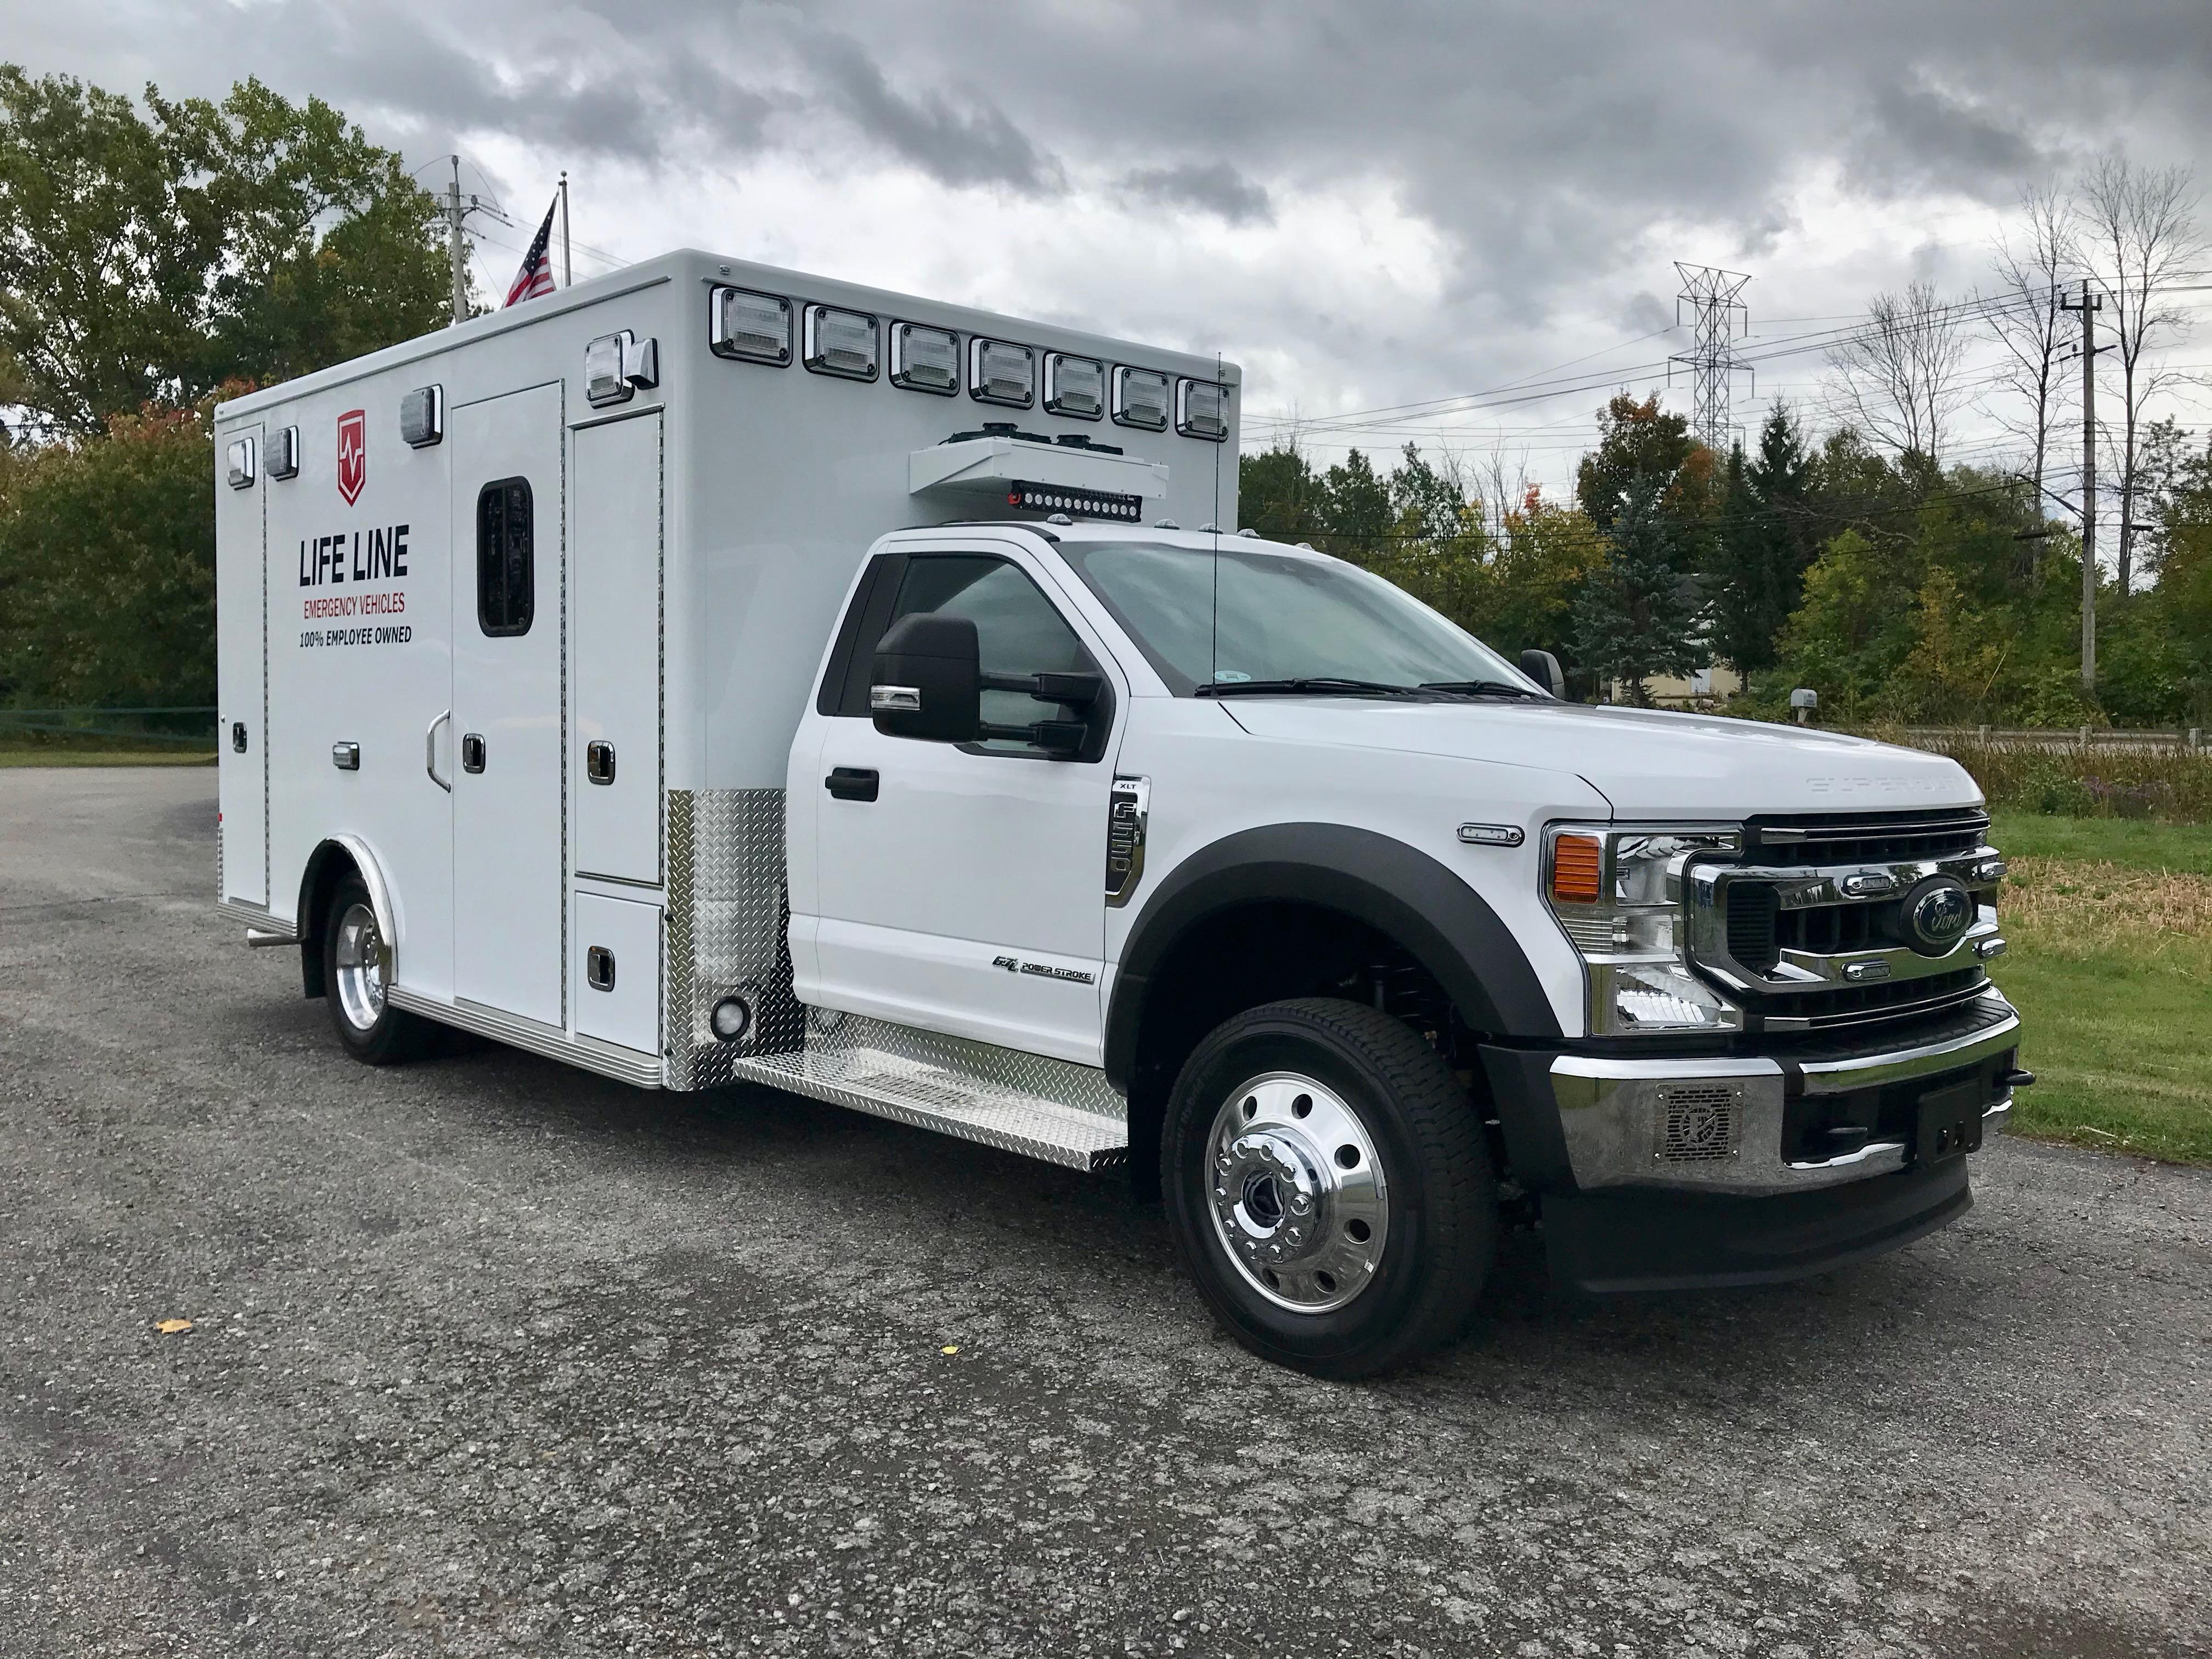 Life-Line-Ambulance-Demo-4